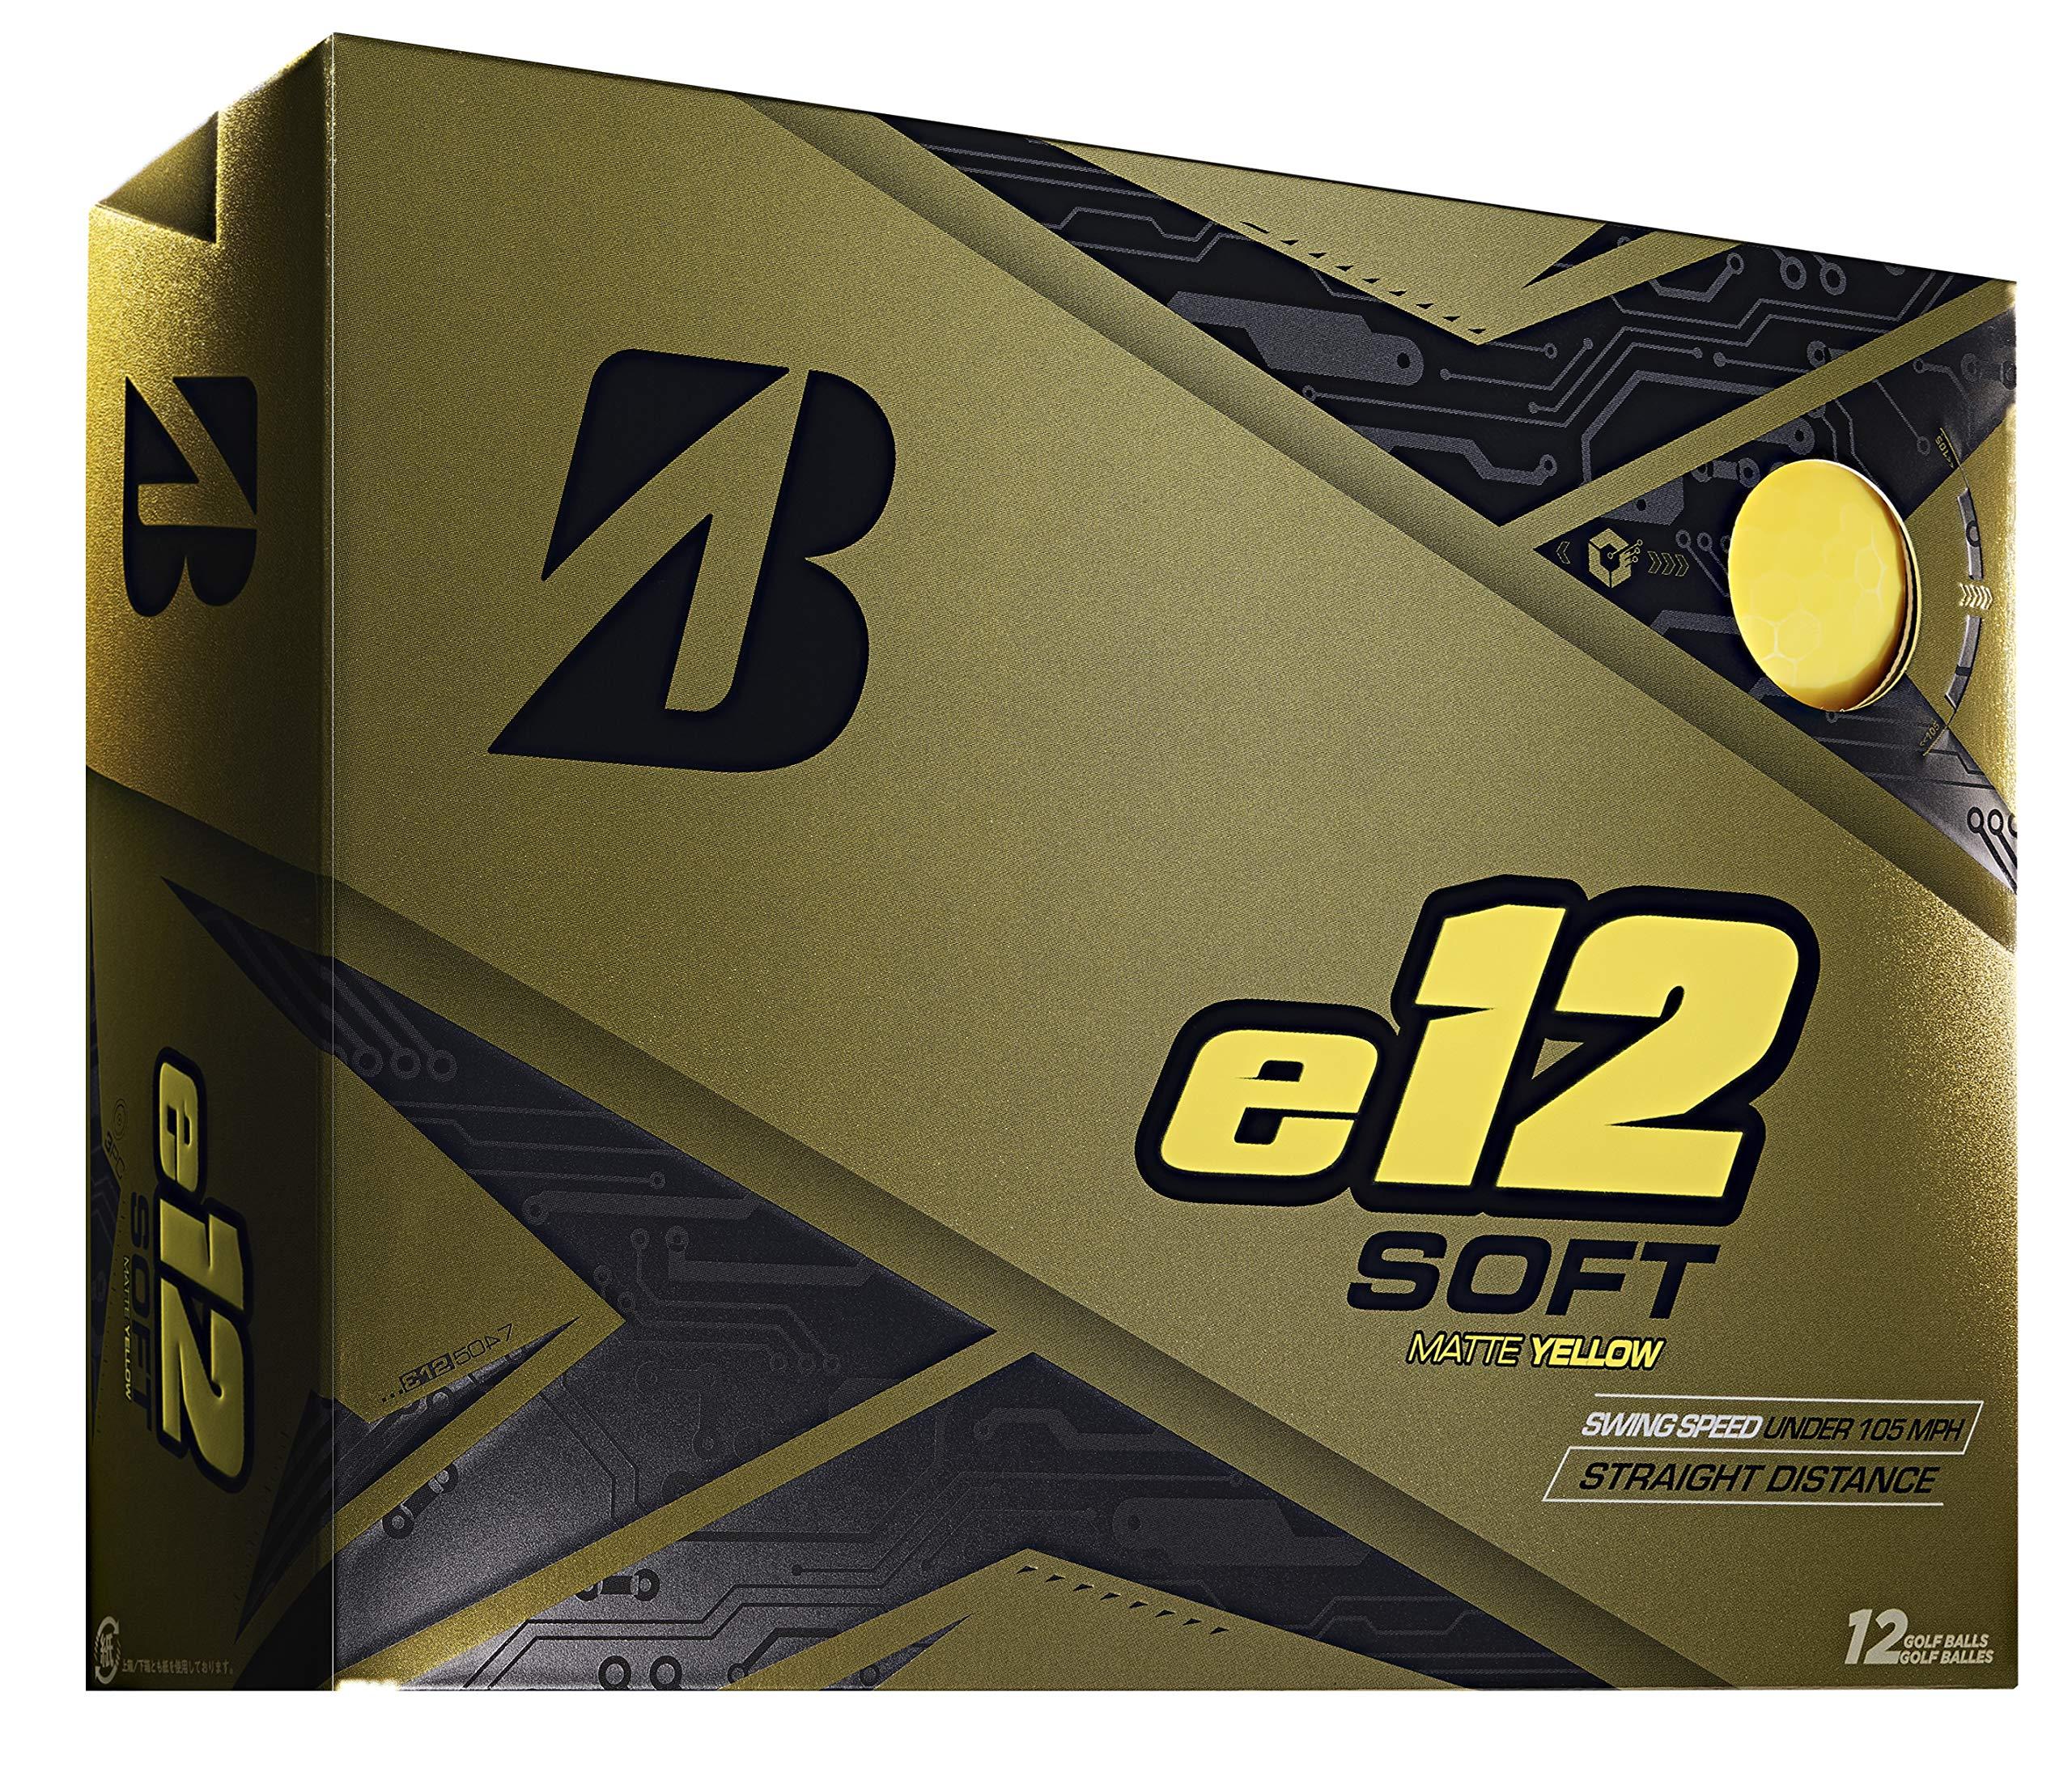 Bridgestone Golf e12 Soft Golf Balls, Matte Yellow (One Dozen) by Bridgestone Golf